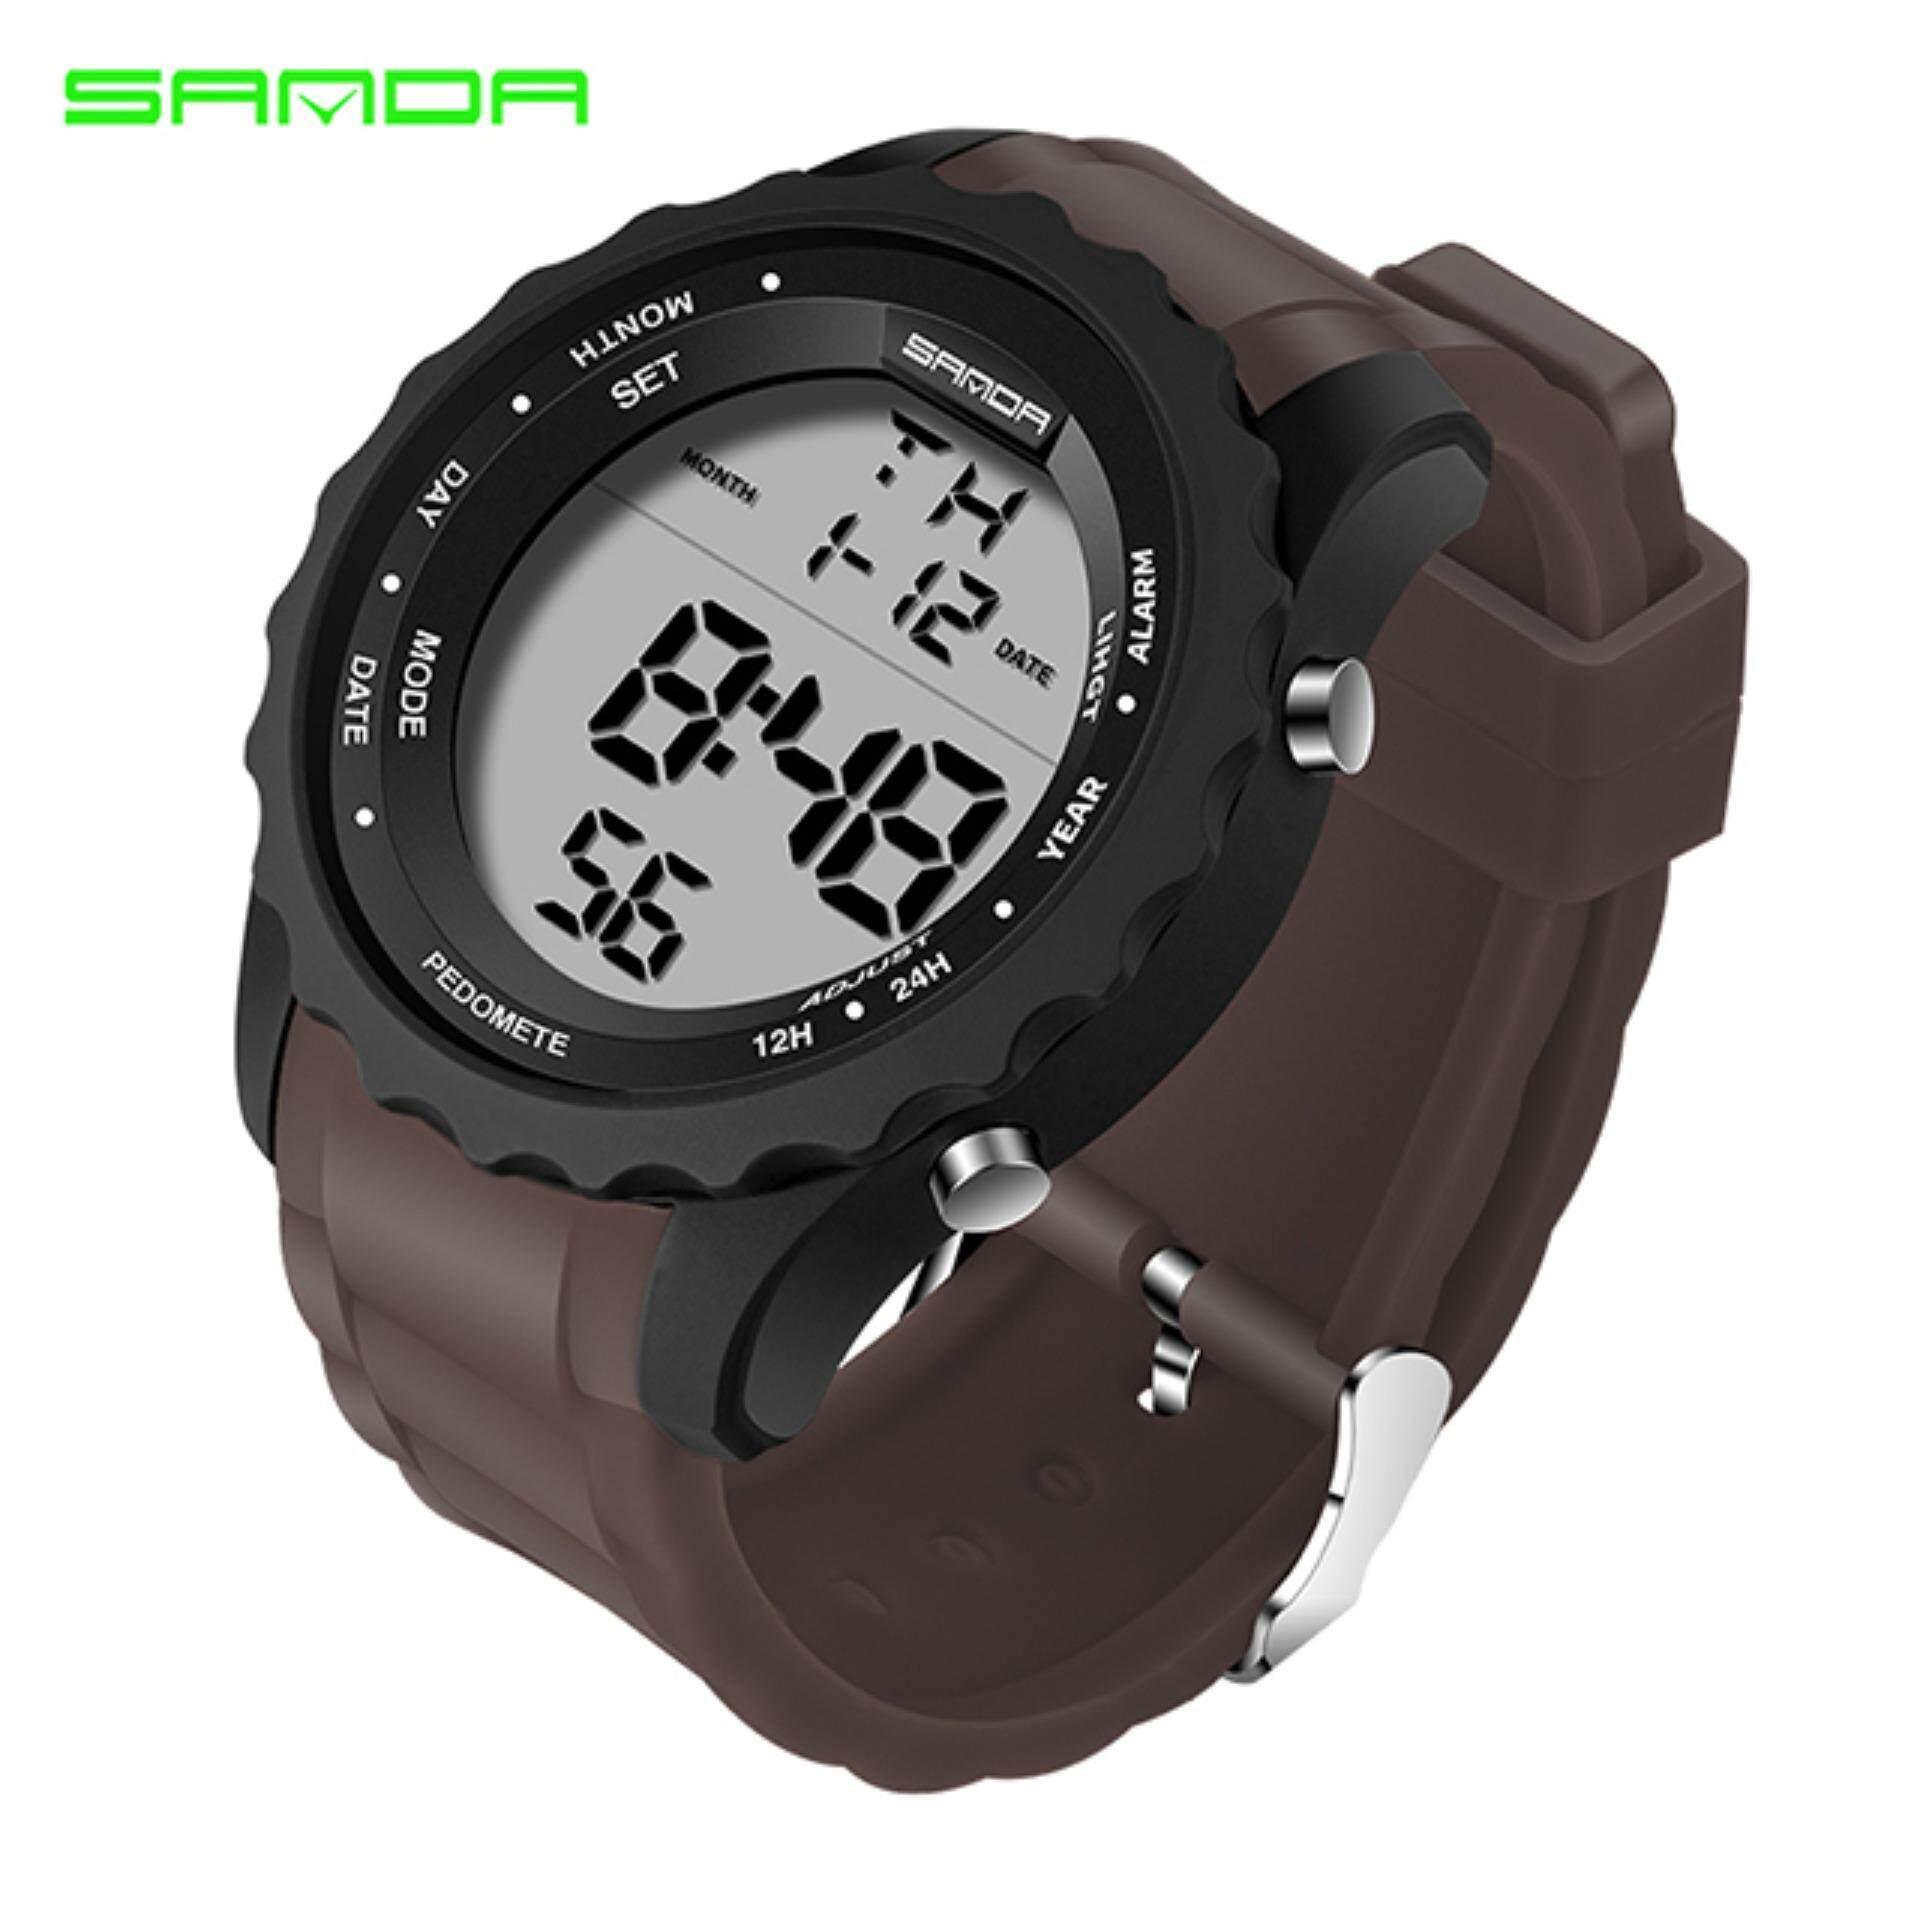 ... SANDA luxury Brand Military Sport Watch Men Casual Chronograph Rubber Watch Strap Waterproof LED Digital Watch